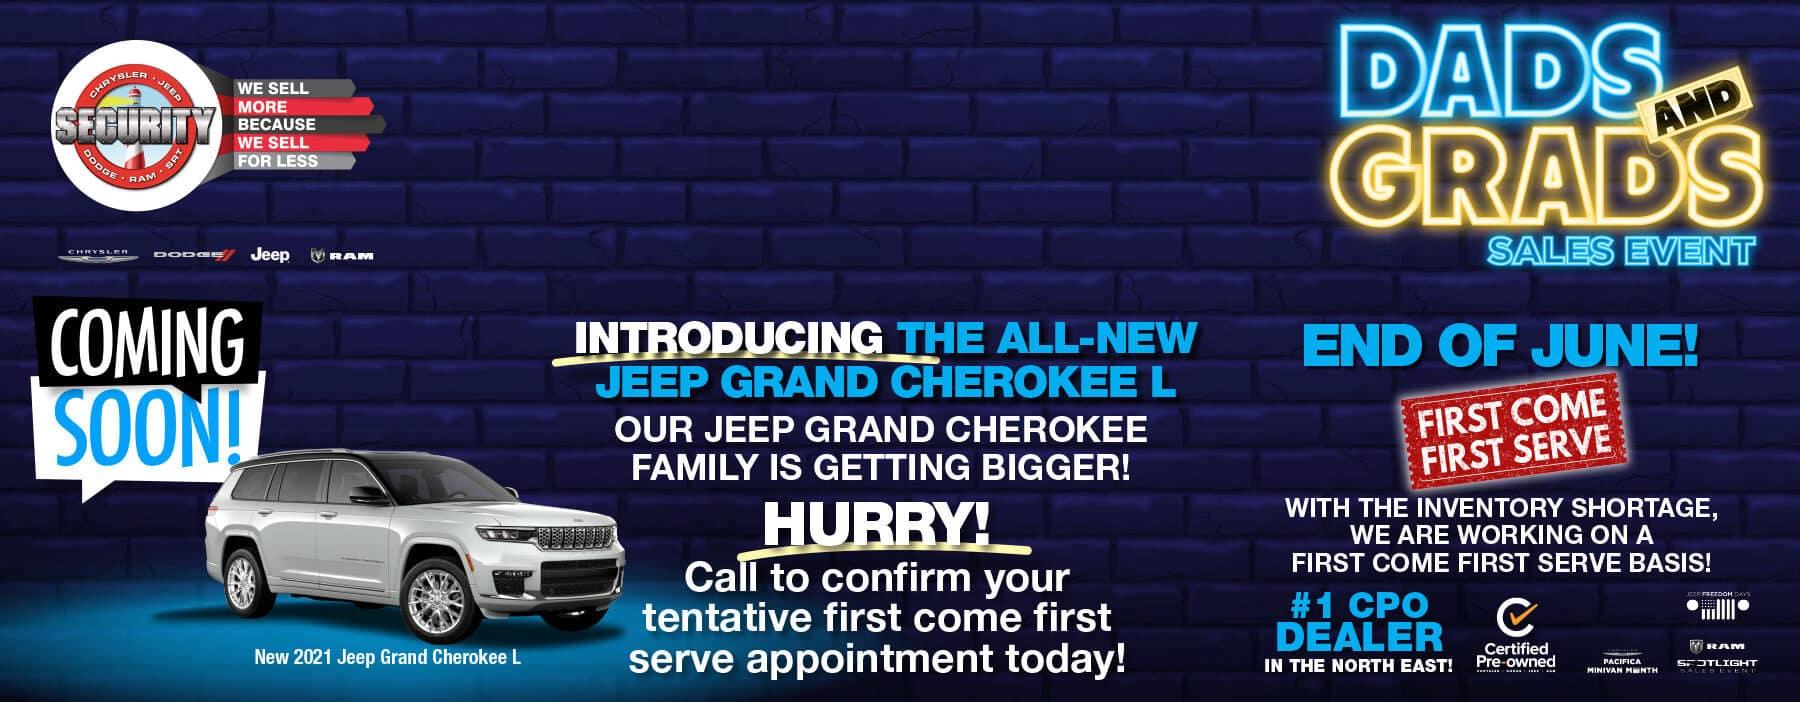 2021.06.14-Security-Dodge-June-Homepage-Banner-2-S52757vw-1